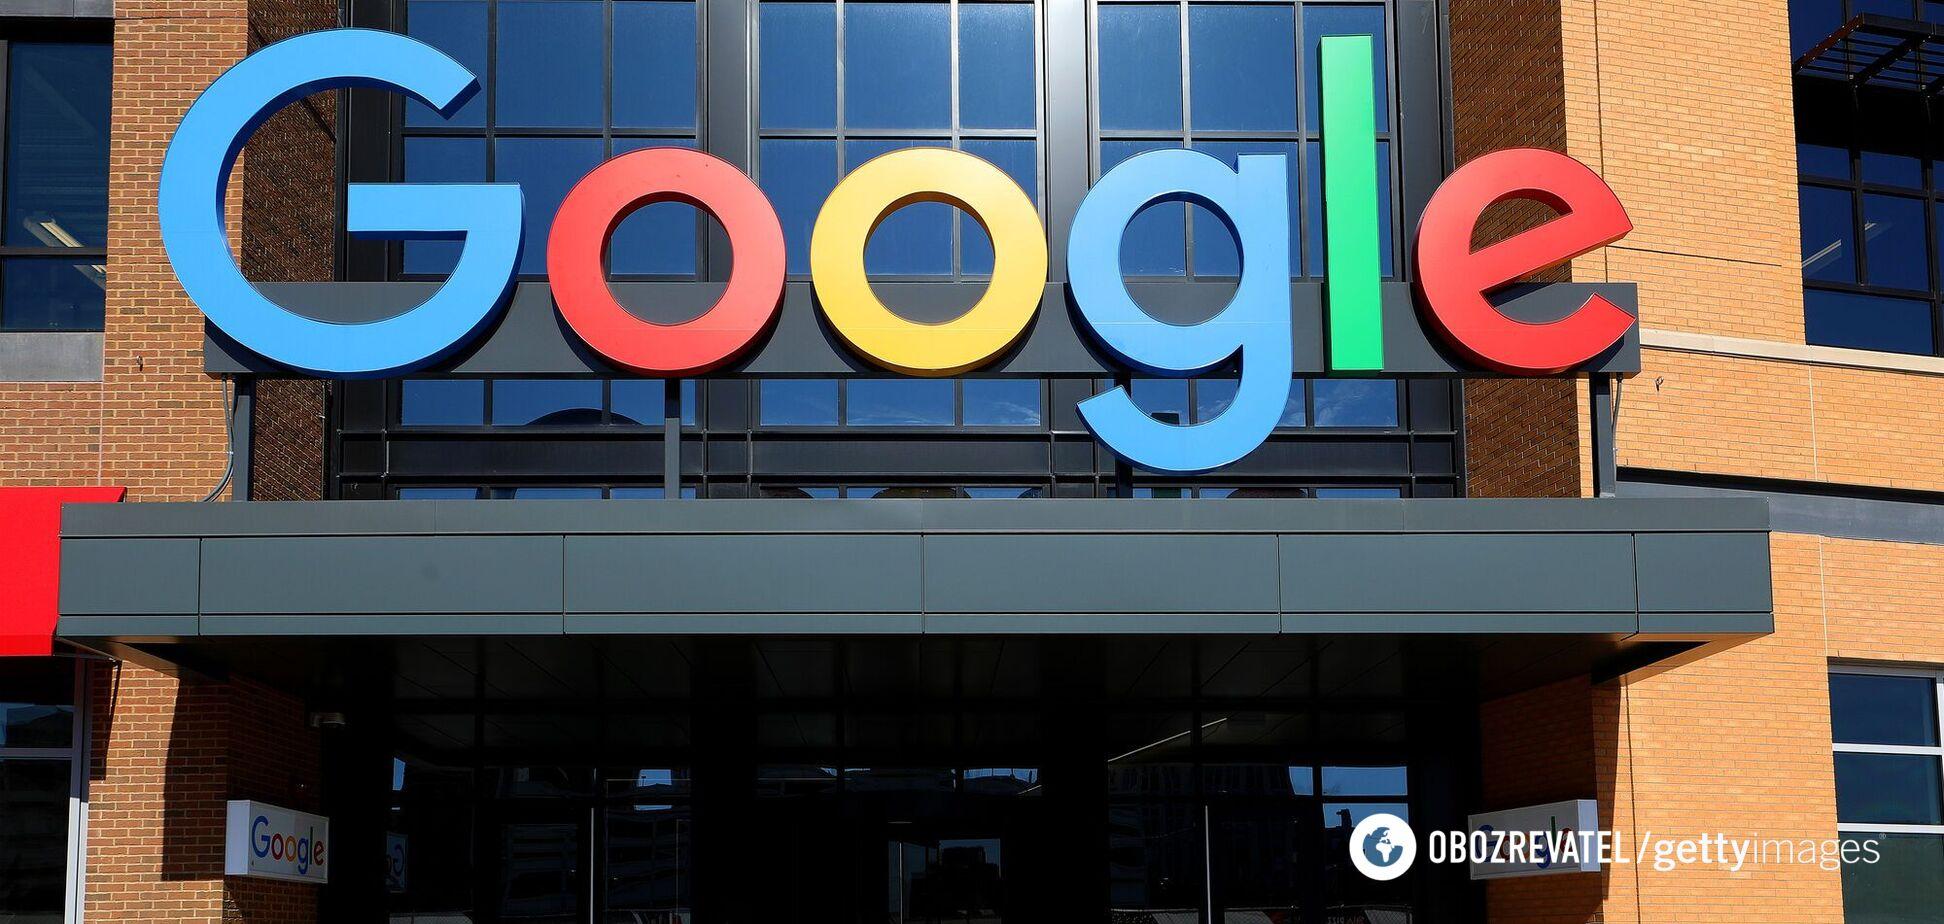 Франция оштрафовала Google на сотни миллионов евро: названа причина